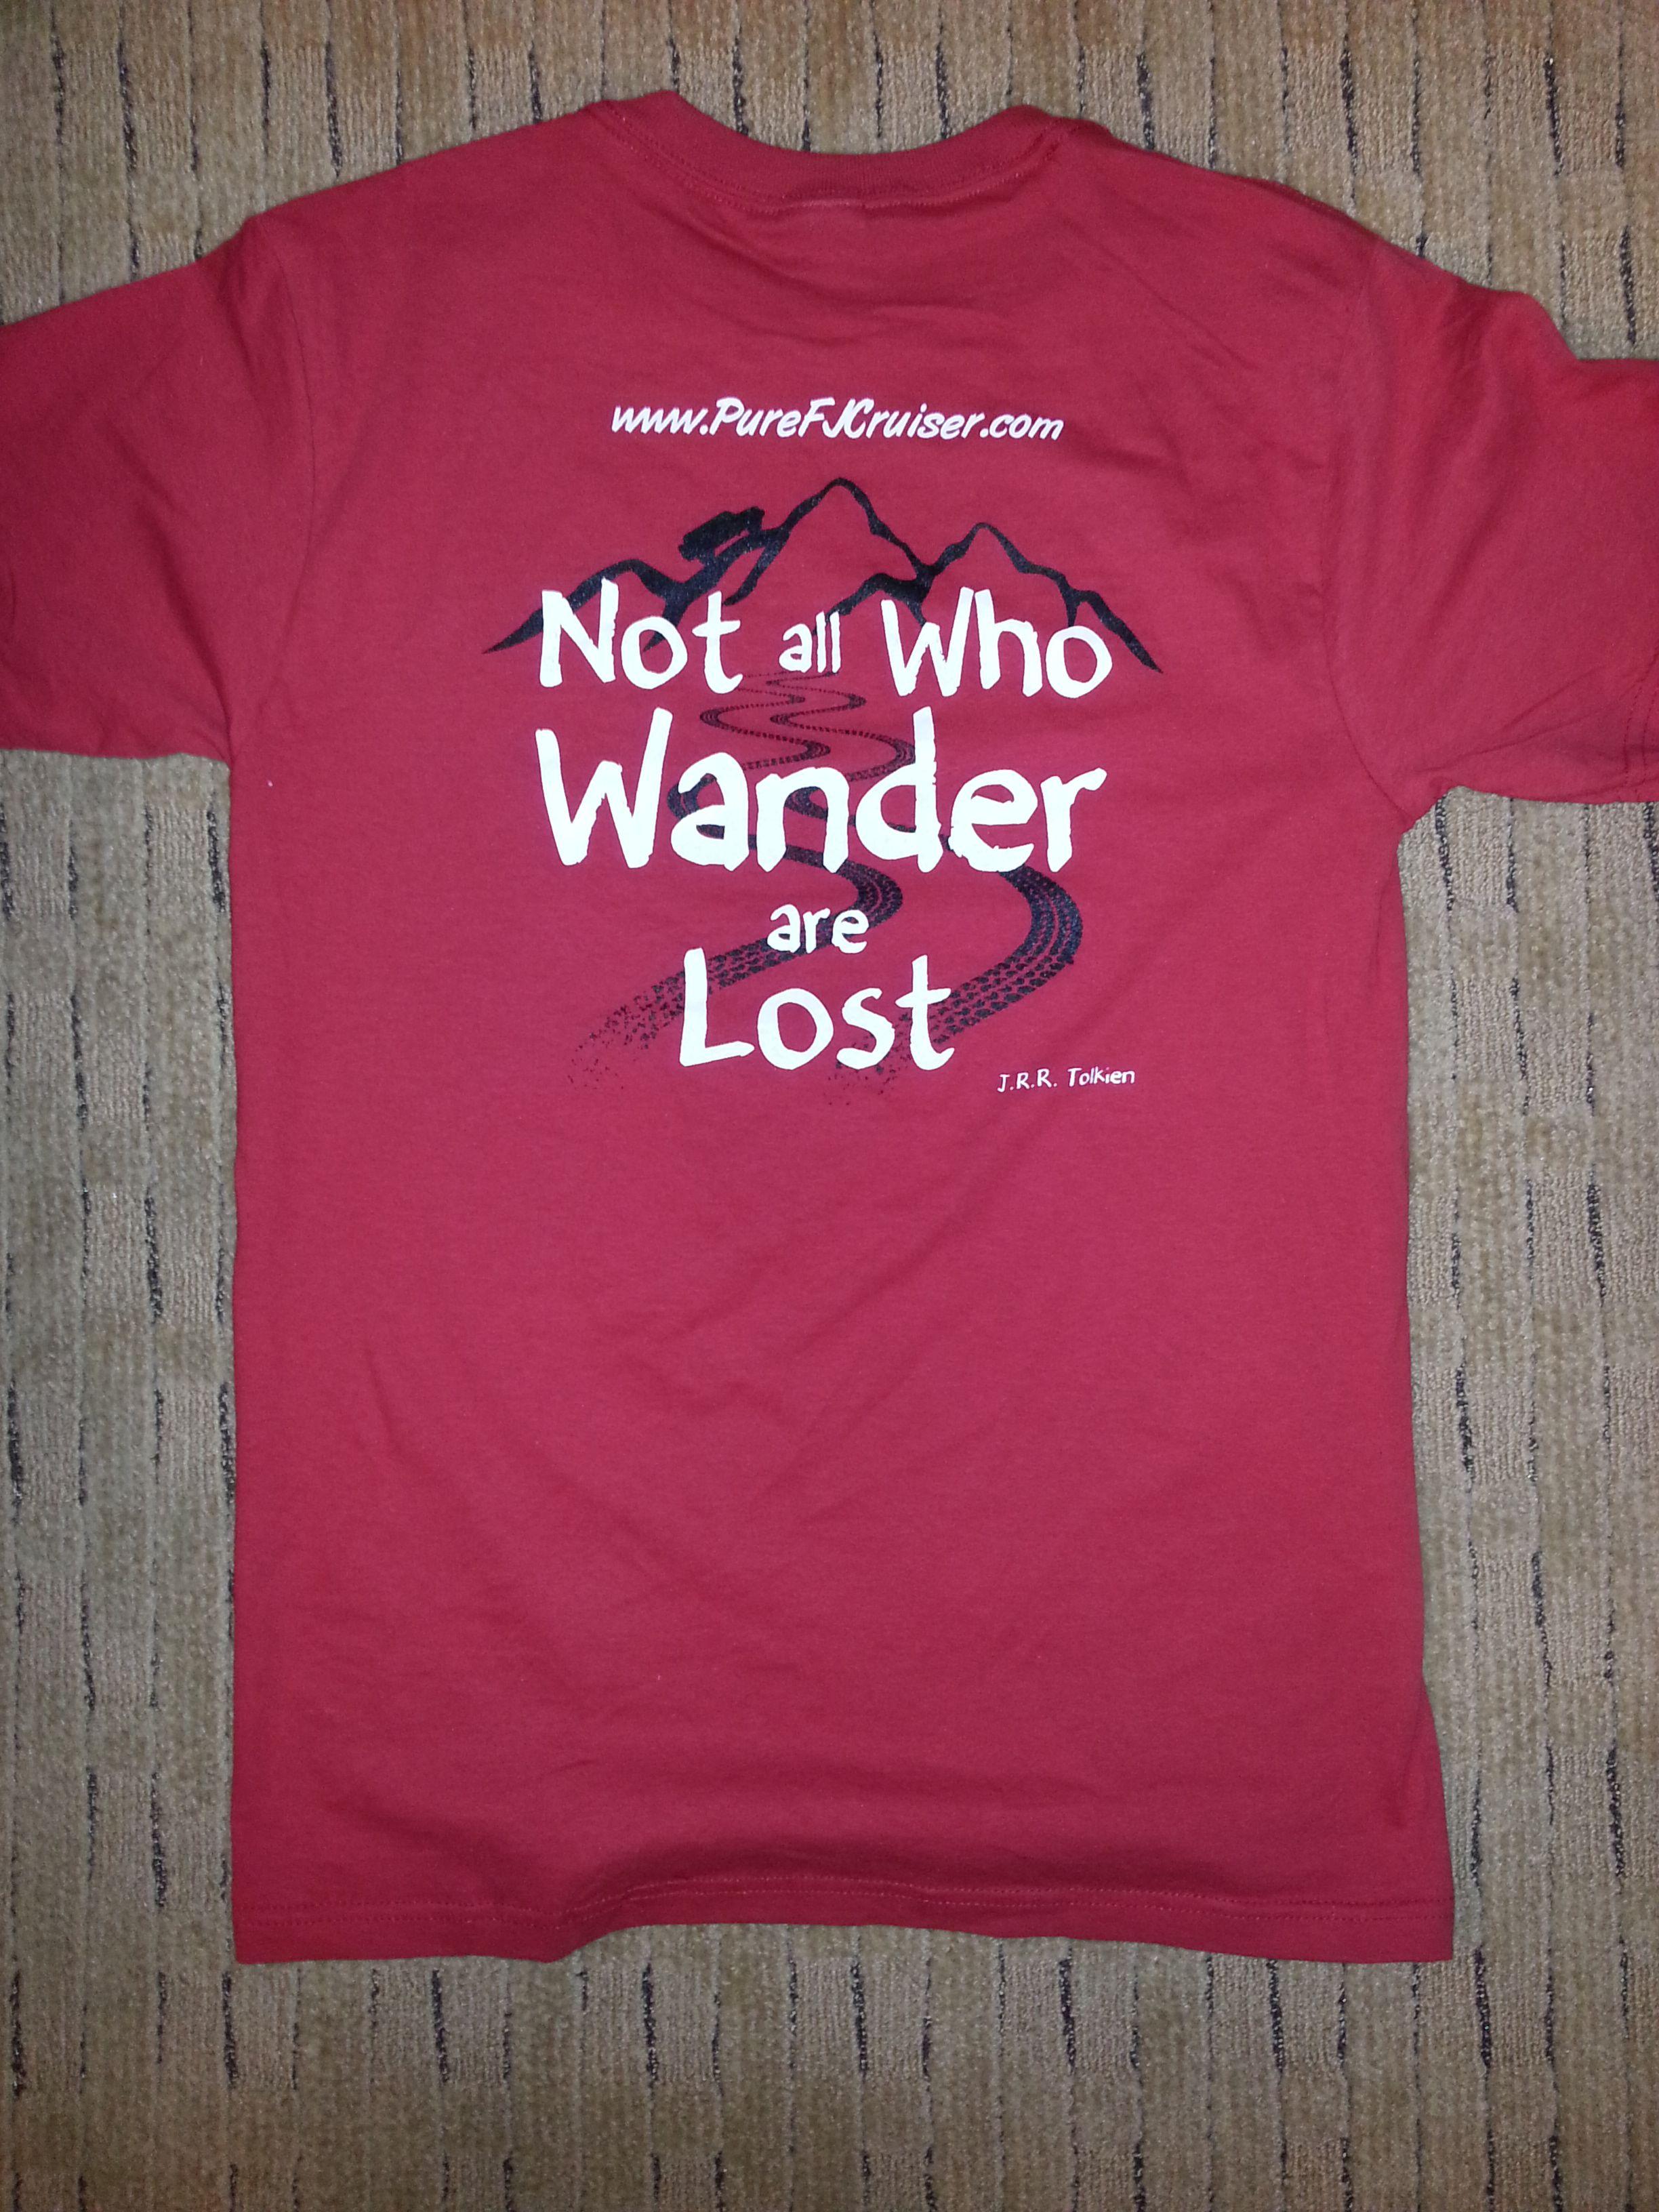 Pure FJ Cruiser T-shirt [PFJ-WanderT] - $10.00 : Pure FJ Cruiser Accessories, Parts and Accessories for your Toyota FJ Cruiser